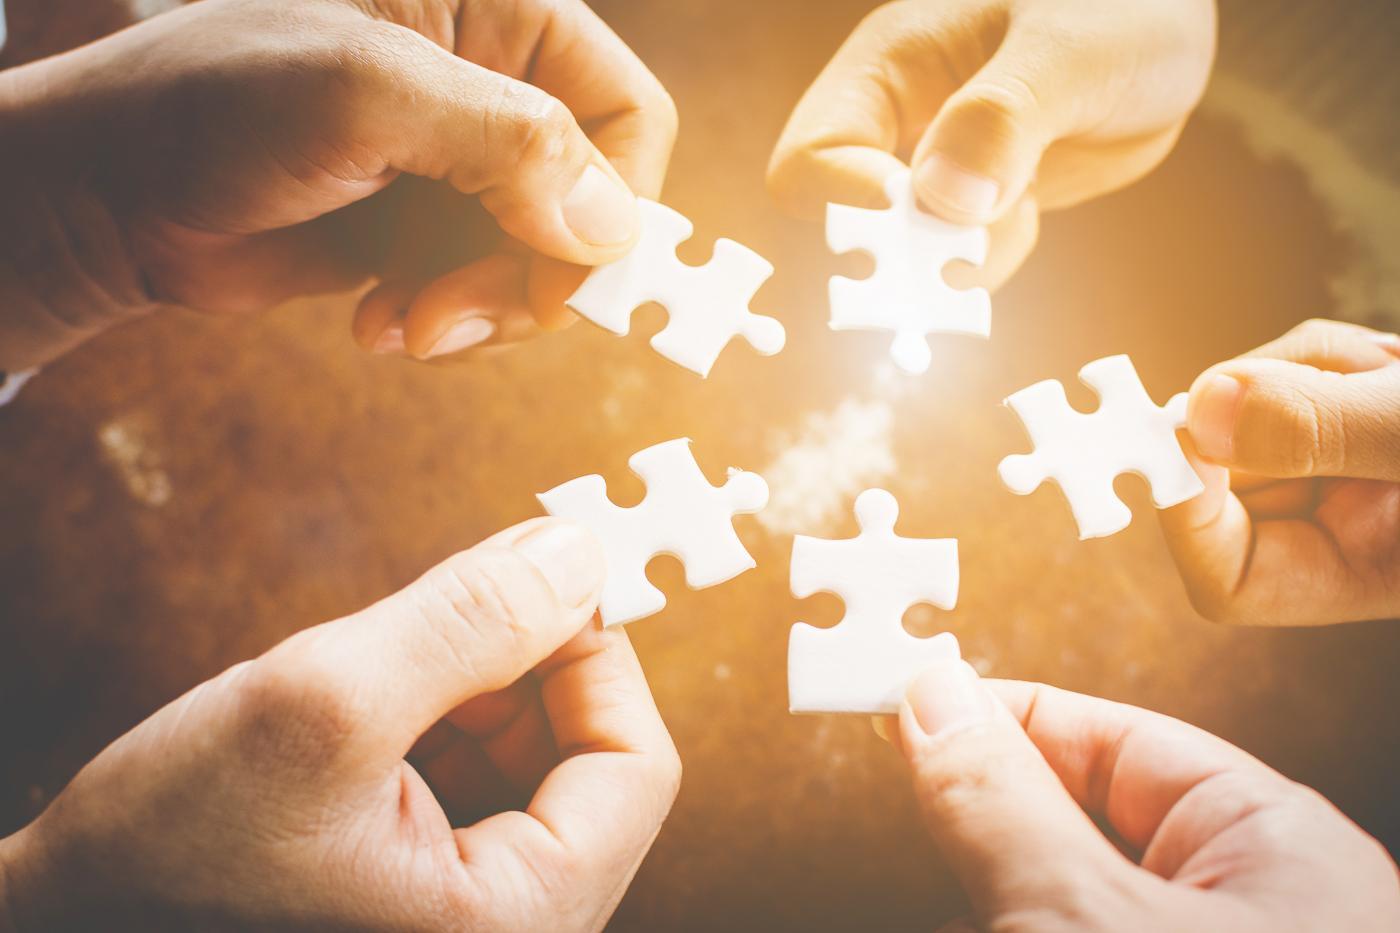 Leading Workers' Compensation Insurer Highlights myMatrixx Partnership